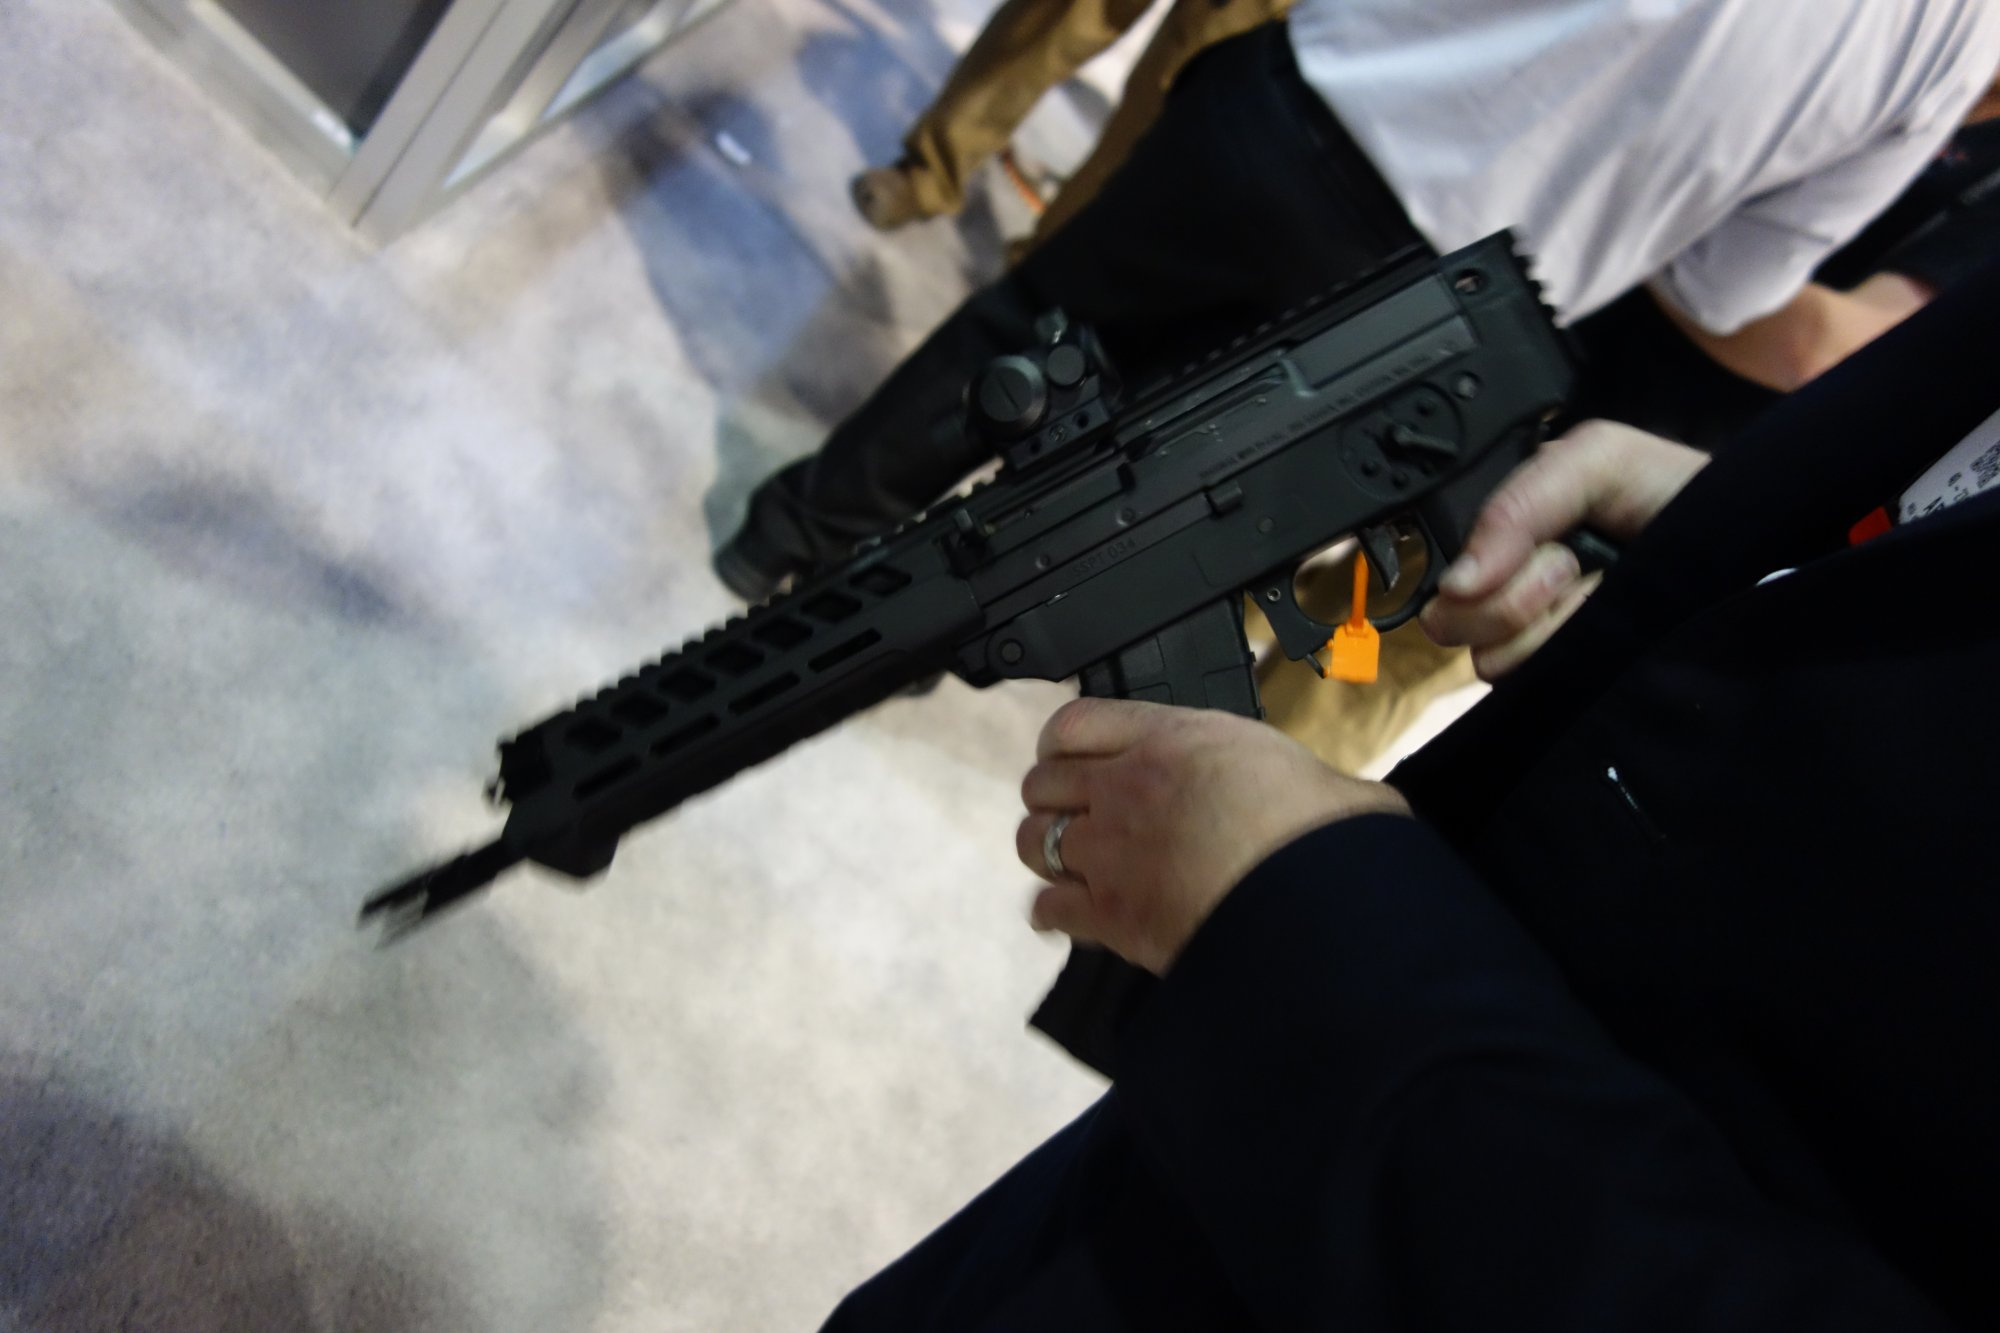 SIG SAUER SIG556xi 7.62x39mm Russian Configuration Semi Auto Only Modular Multi Caliber Combat Tactical Carbine Kalashnikov AK 47 AKM SHOT Show 2014 1 15 14 David Crane DefenseReview.com DR 2 rotated SIG SAUER SIG556xi Modular, Multi Caliber (5.56mm NATO, 300 AAC Blackout/300BLK, 7.62x39mm Russian) Gas Piston/Op Rod Combat/Tactical Rifle/Carbine/SBR with Kalashnikov AK 47/AKM Configuration Capability!